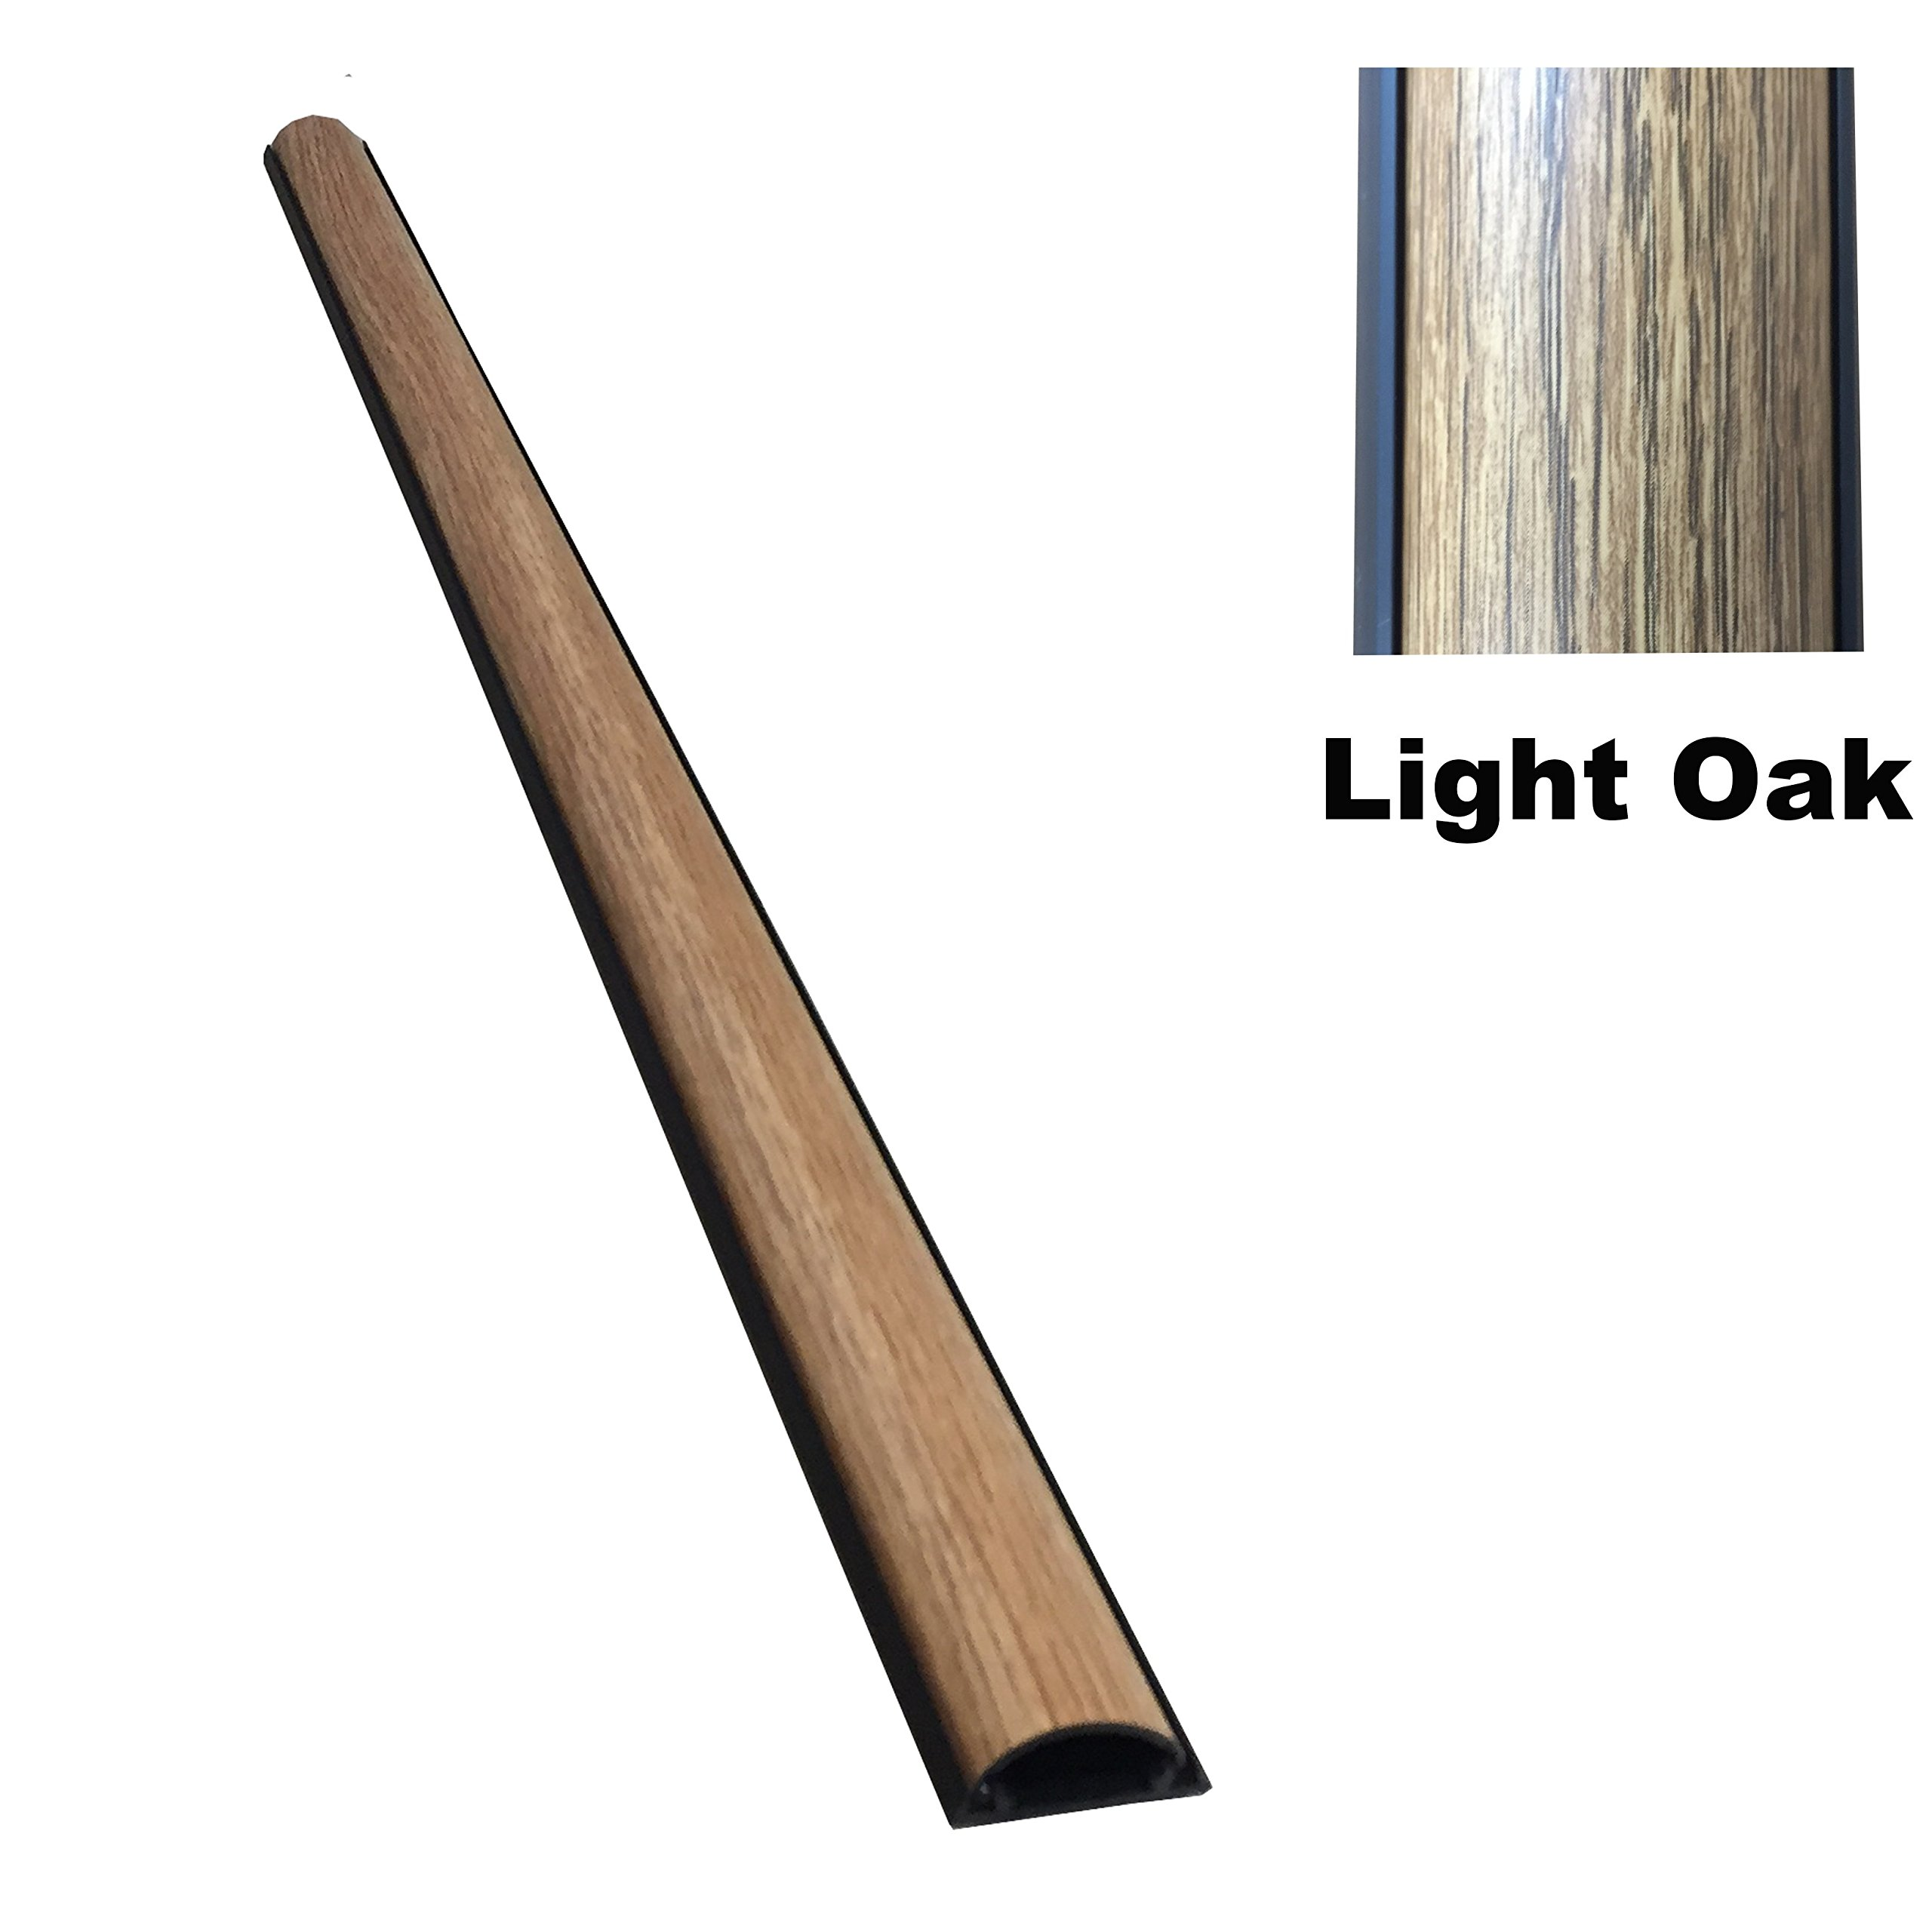 ChordSavers StudioSaver Cord Cover - 1 Piece - Color: Light Oak